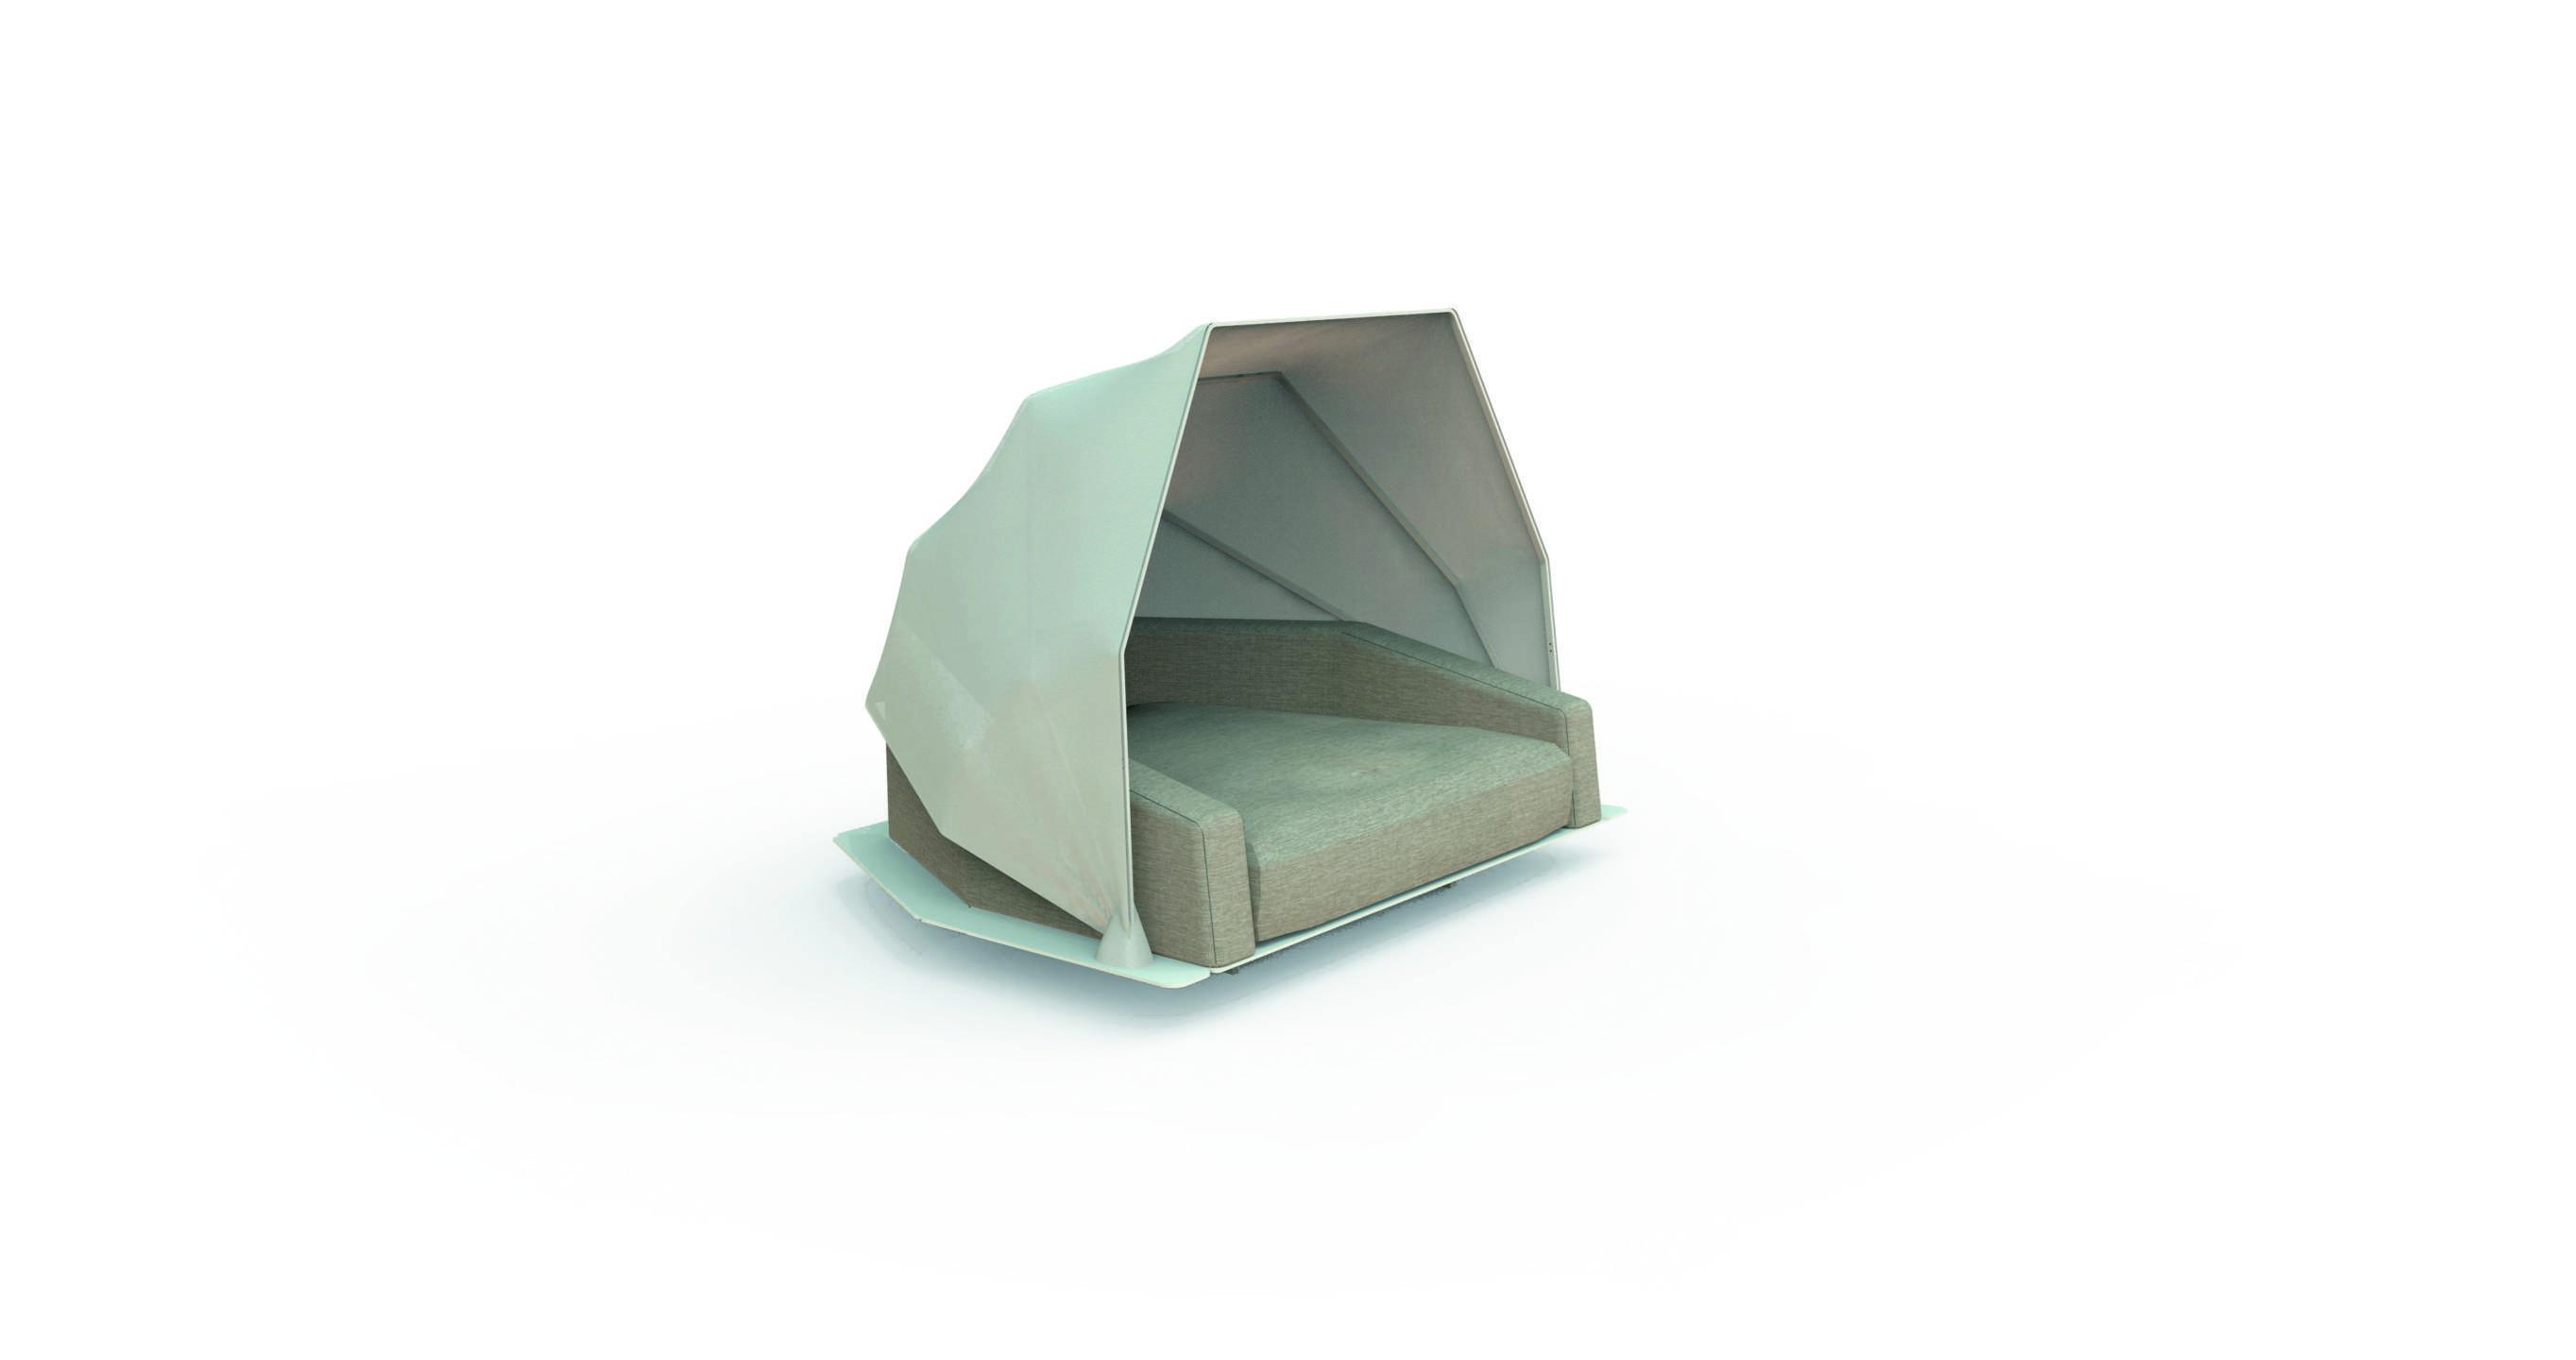 Vivereverde daybed edencollection mobili da giardino for Negozi mobili da giardino